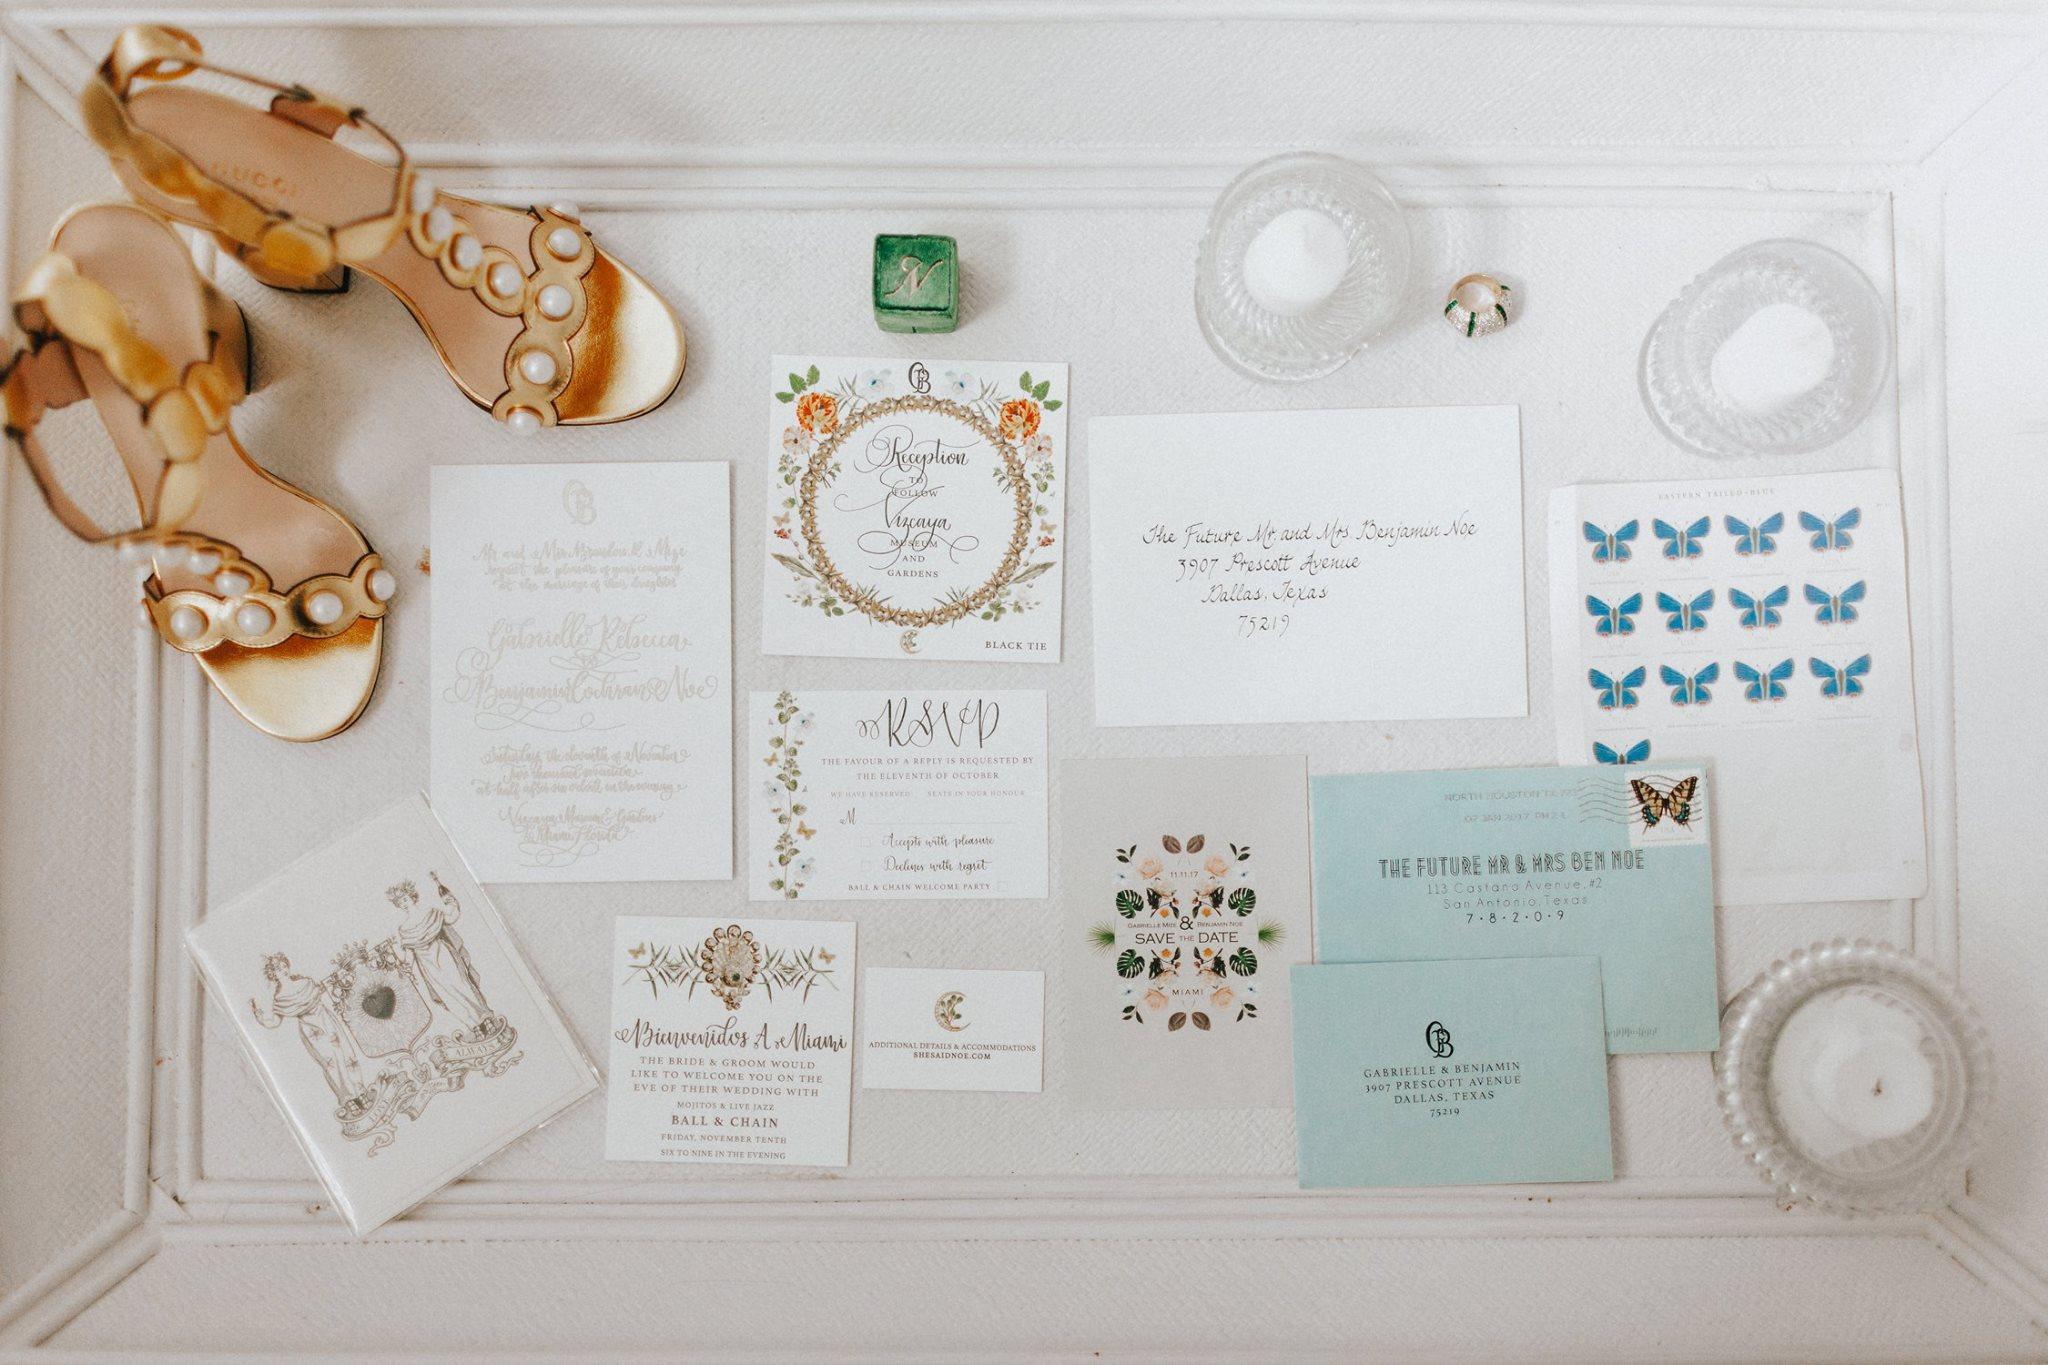 Catering Luxury Destination Wedding in Miami 2.jpg